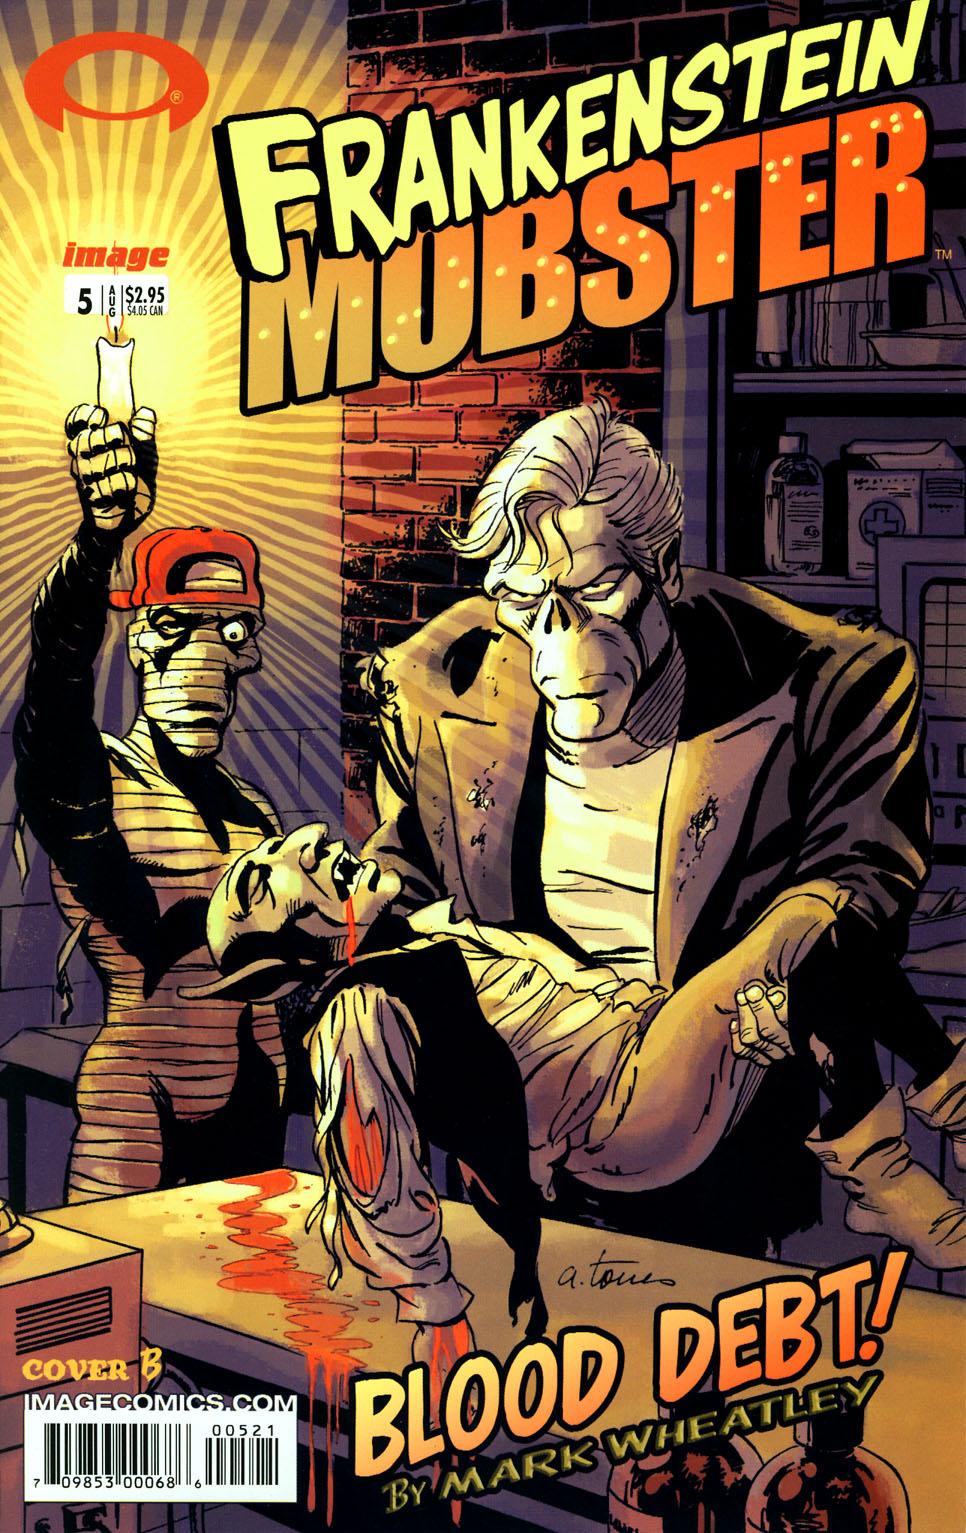 Frankenstein Mobster (2003) 5B, cover by Angelo Torres.